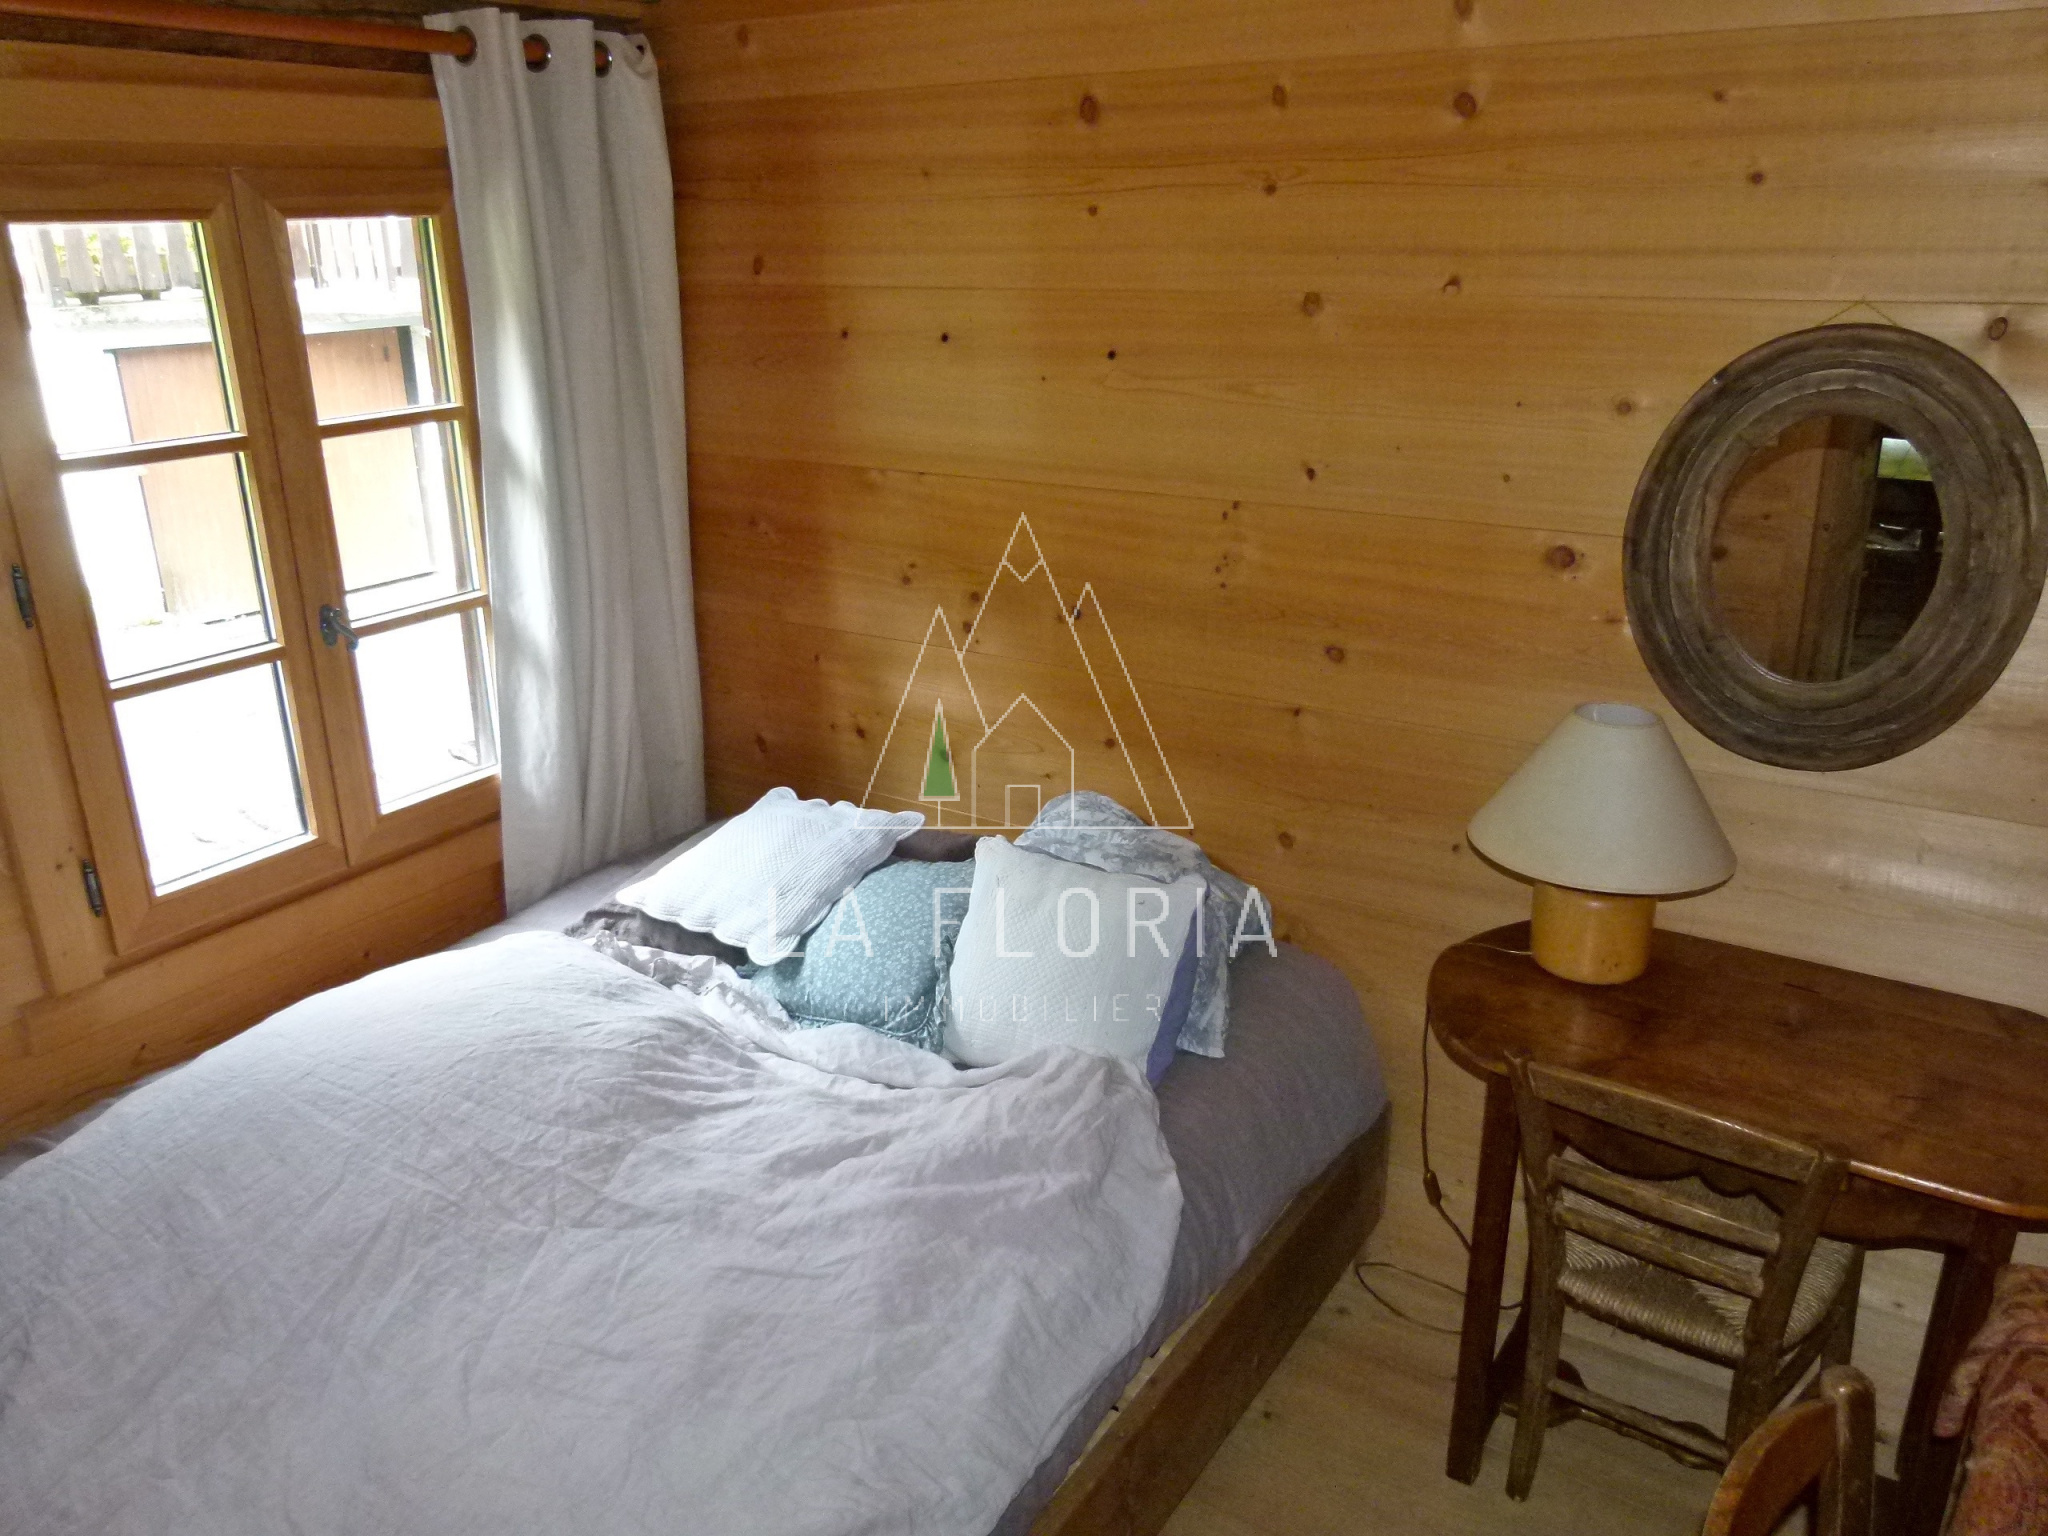 HUGE  6 BEDROOM TRIPLEX WITH CELLAR AND GARDEN IN QUIET AREA, LES HOUCHES